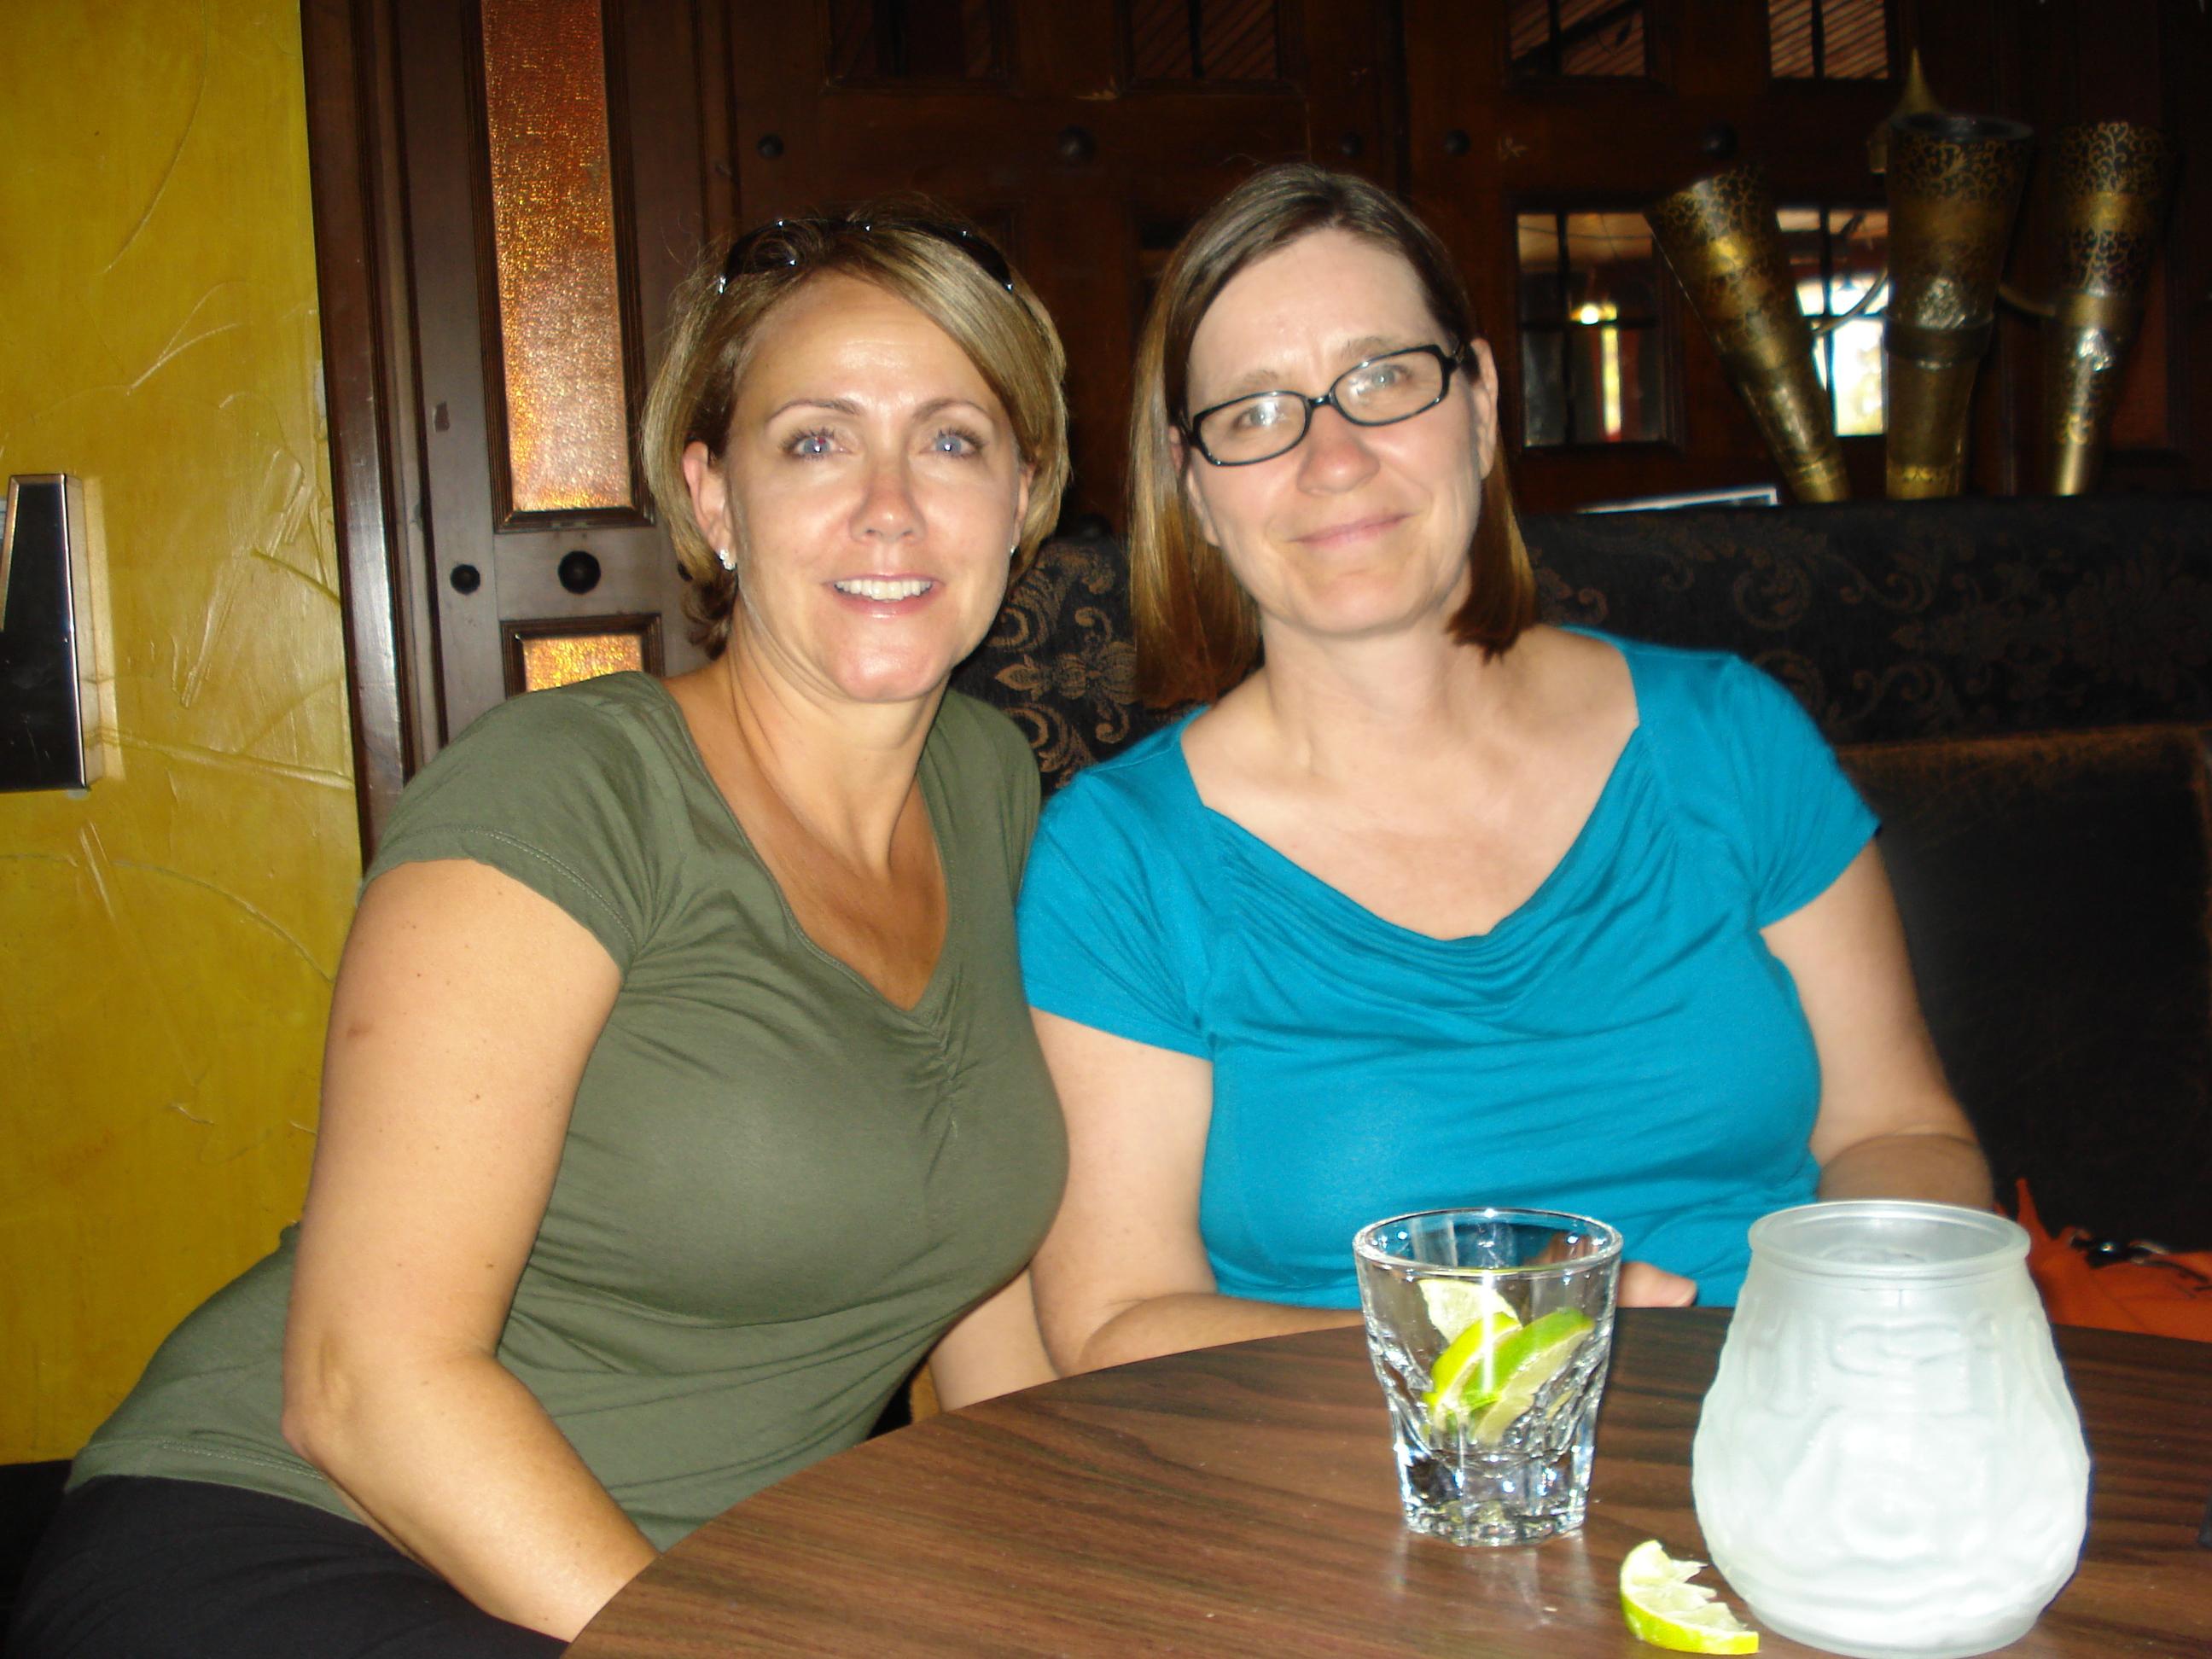 Paralegal, Kim Gonzalez and Attorney, Anne Findling